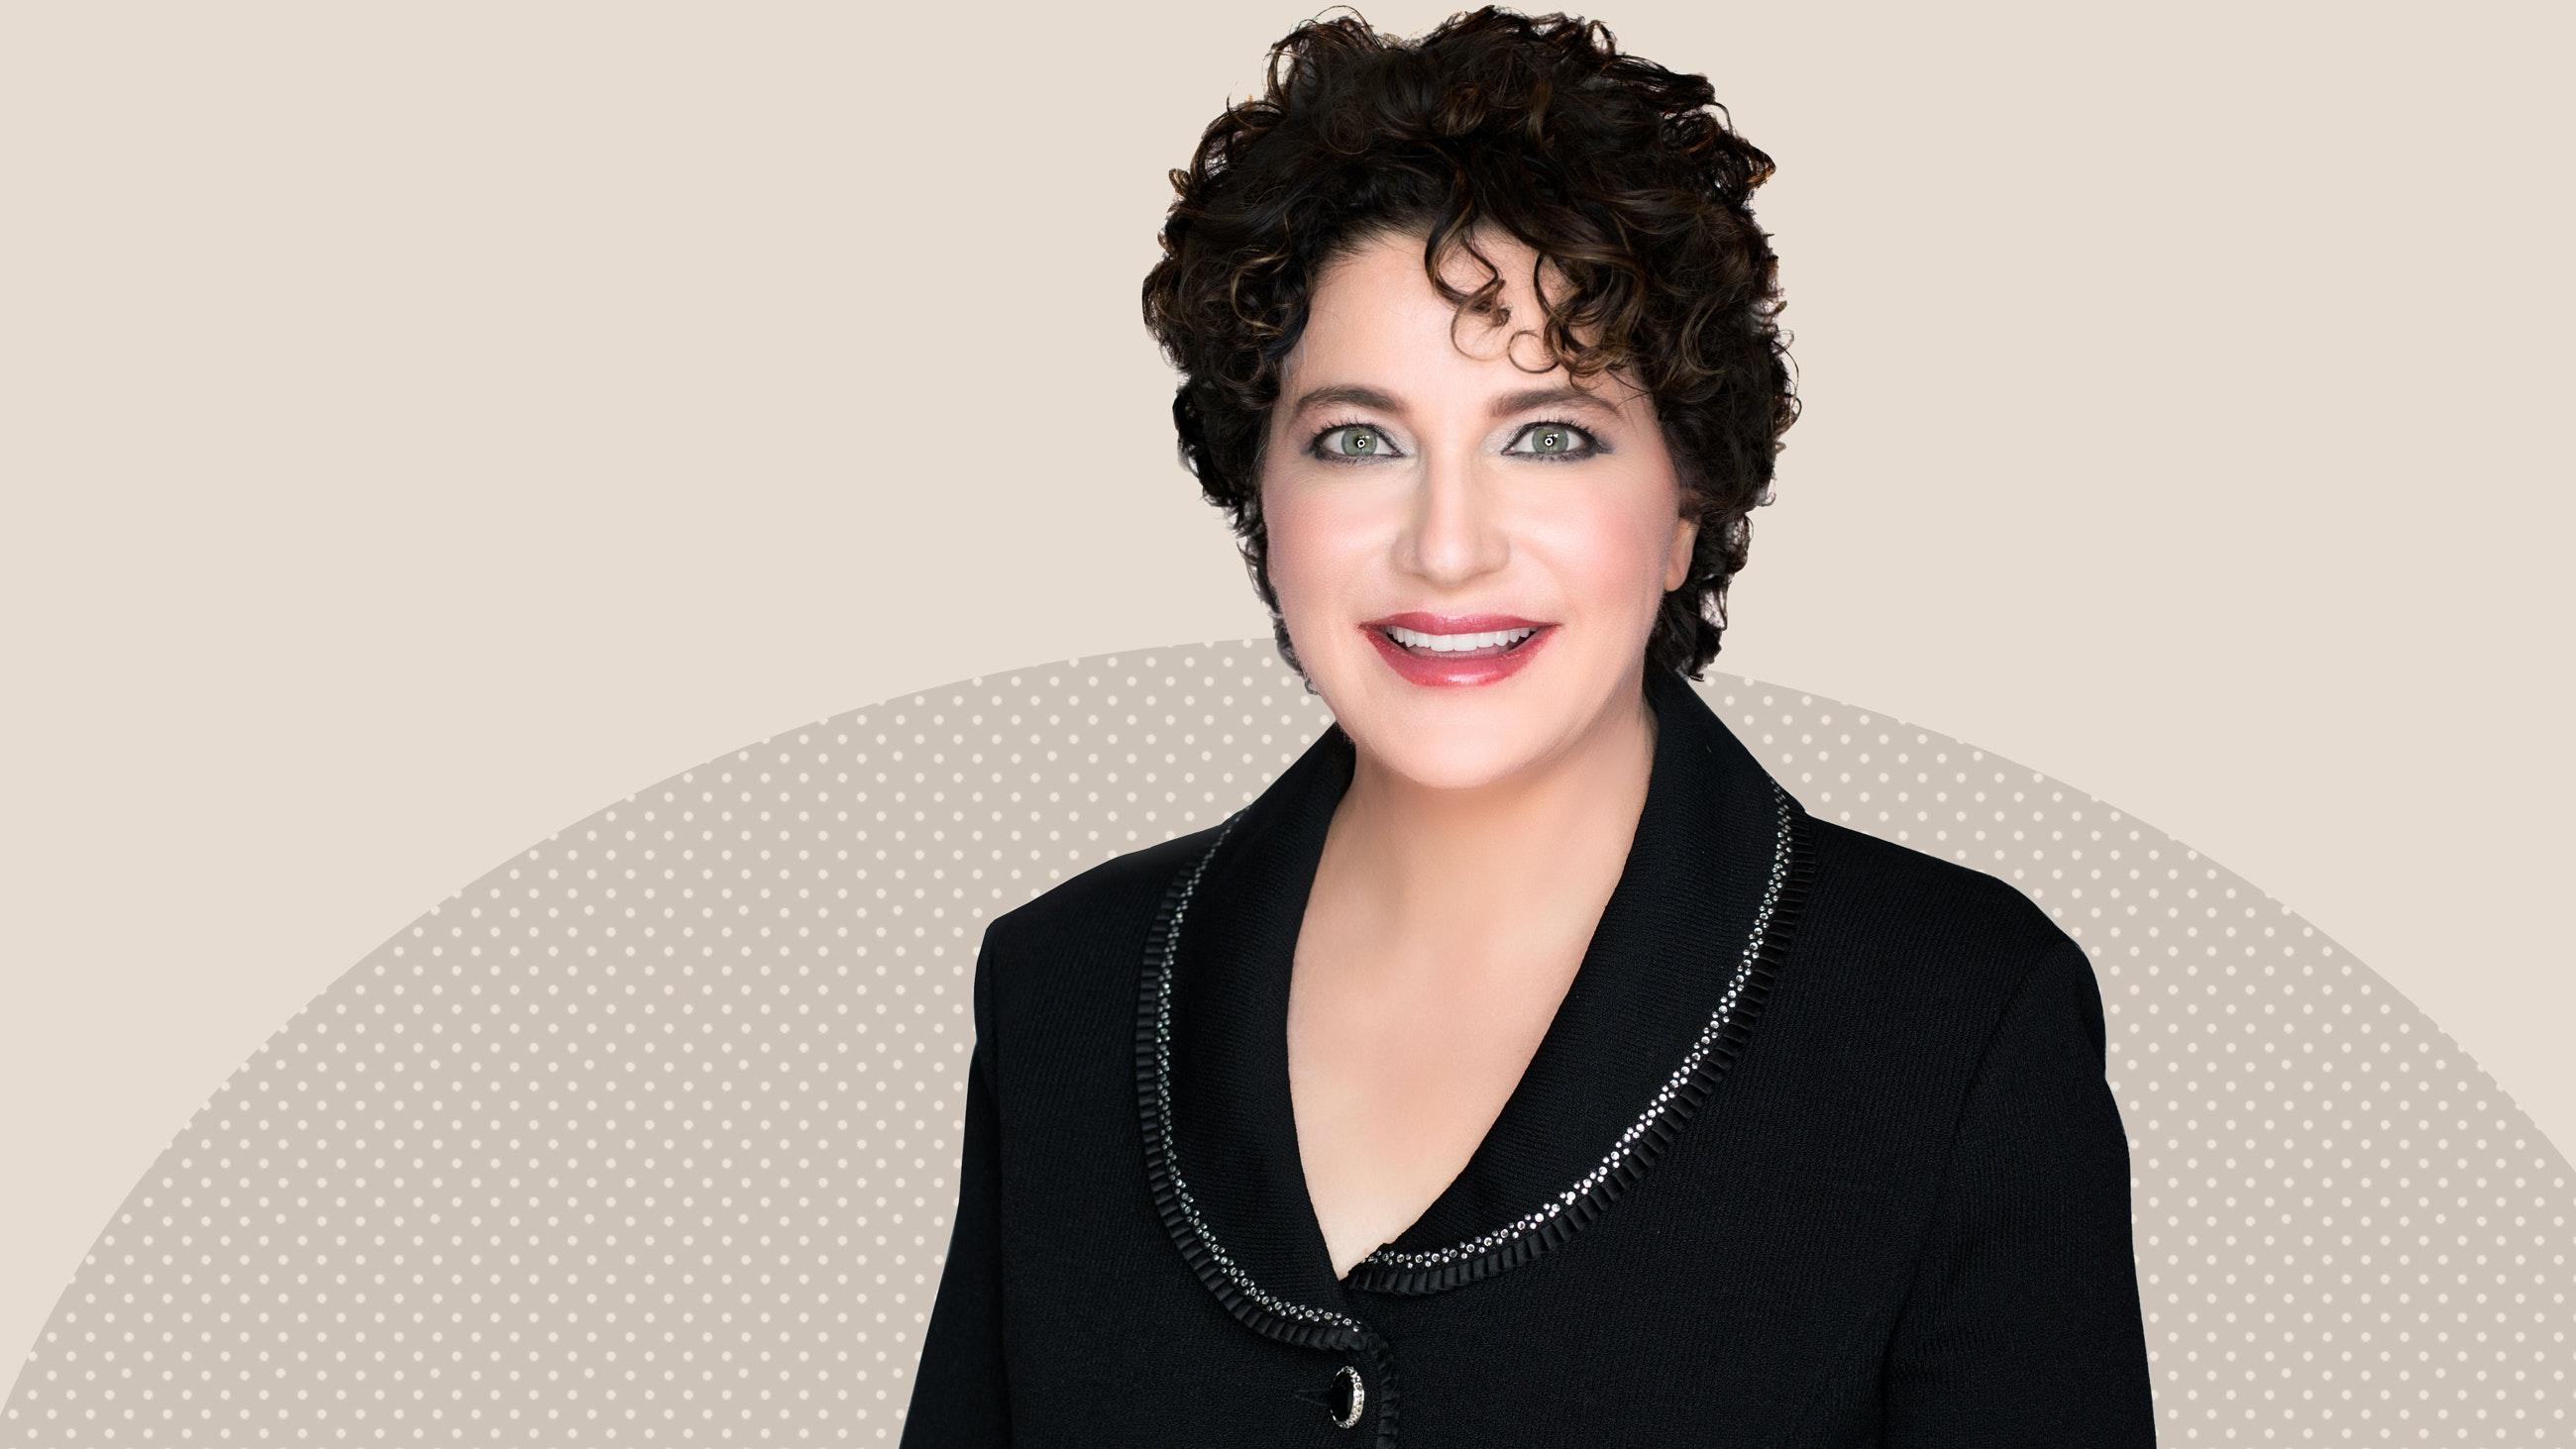 Dr. Marguerite Germain